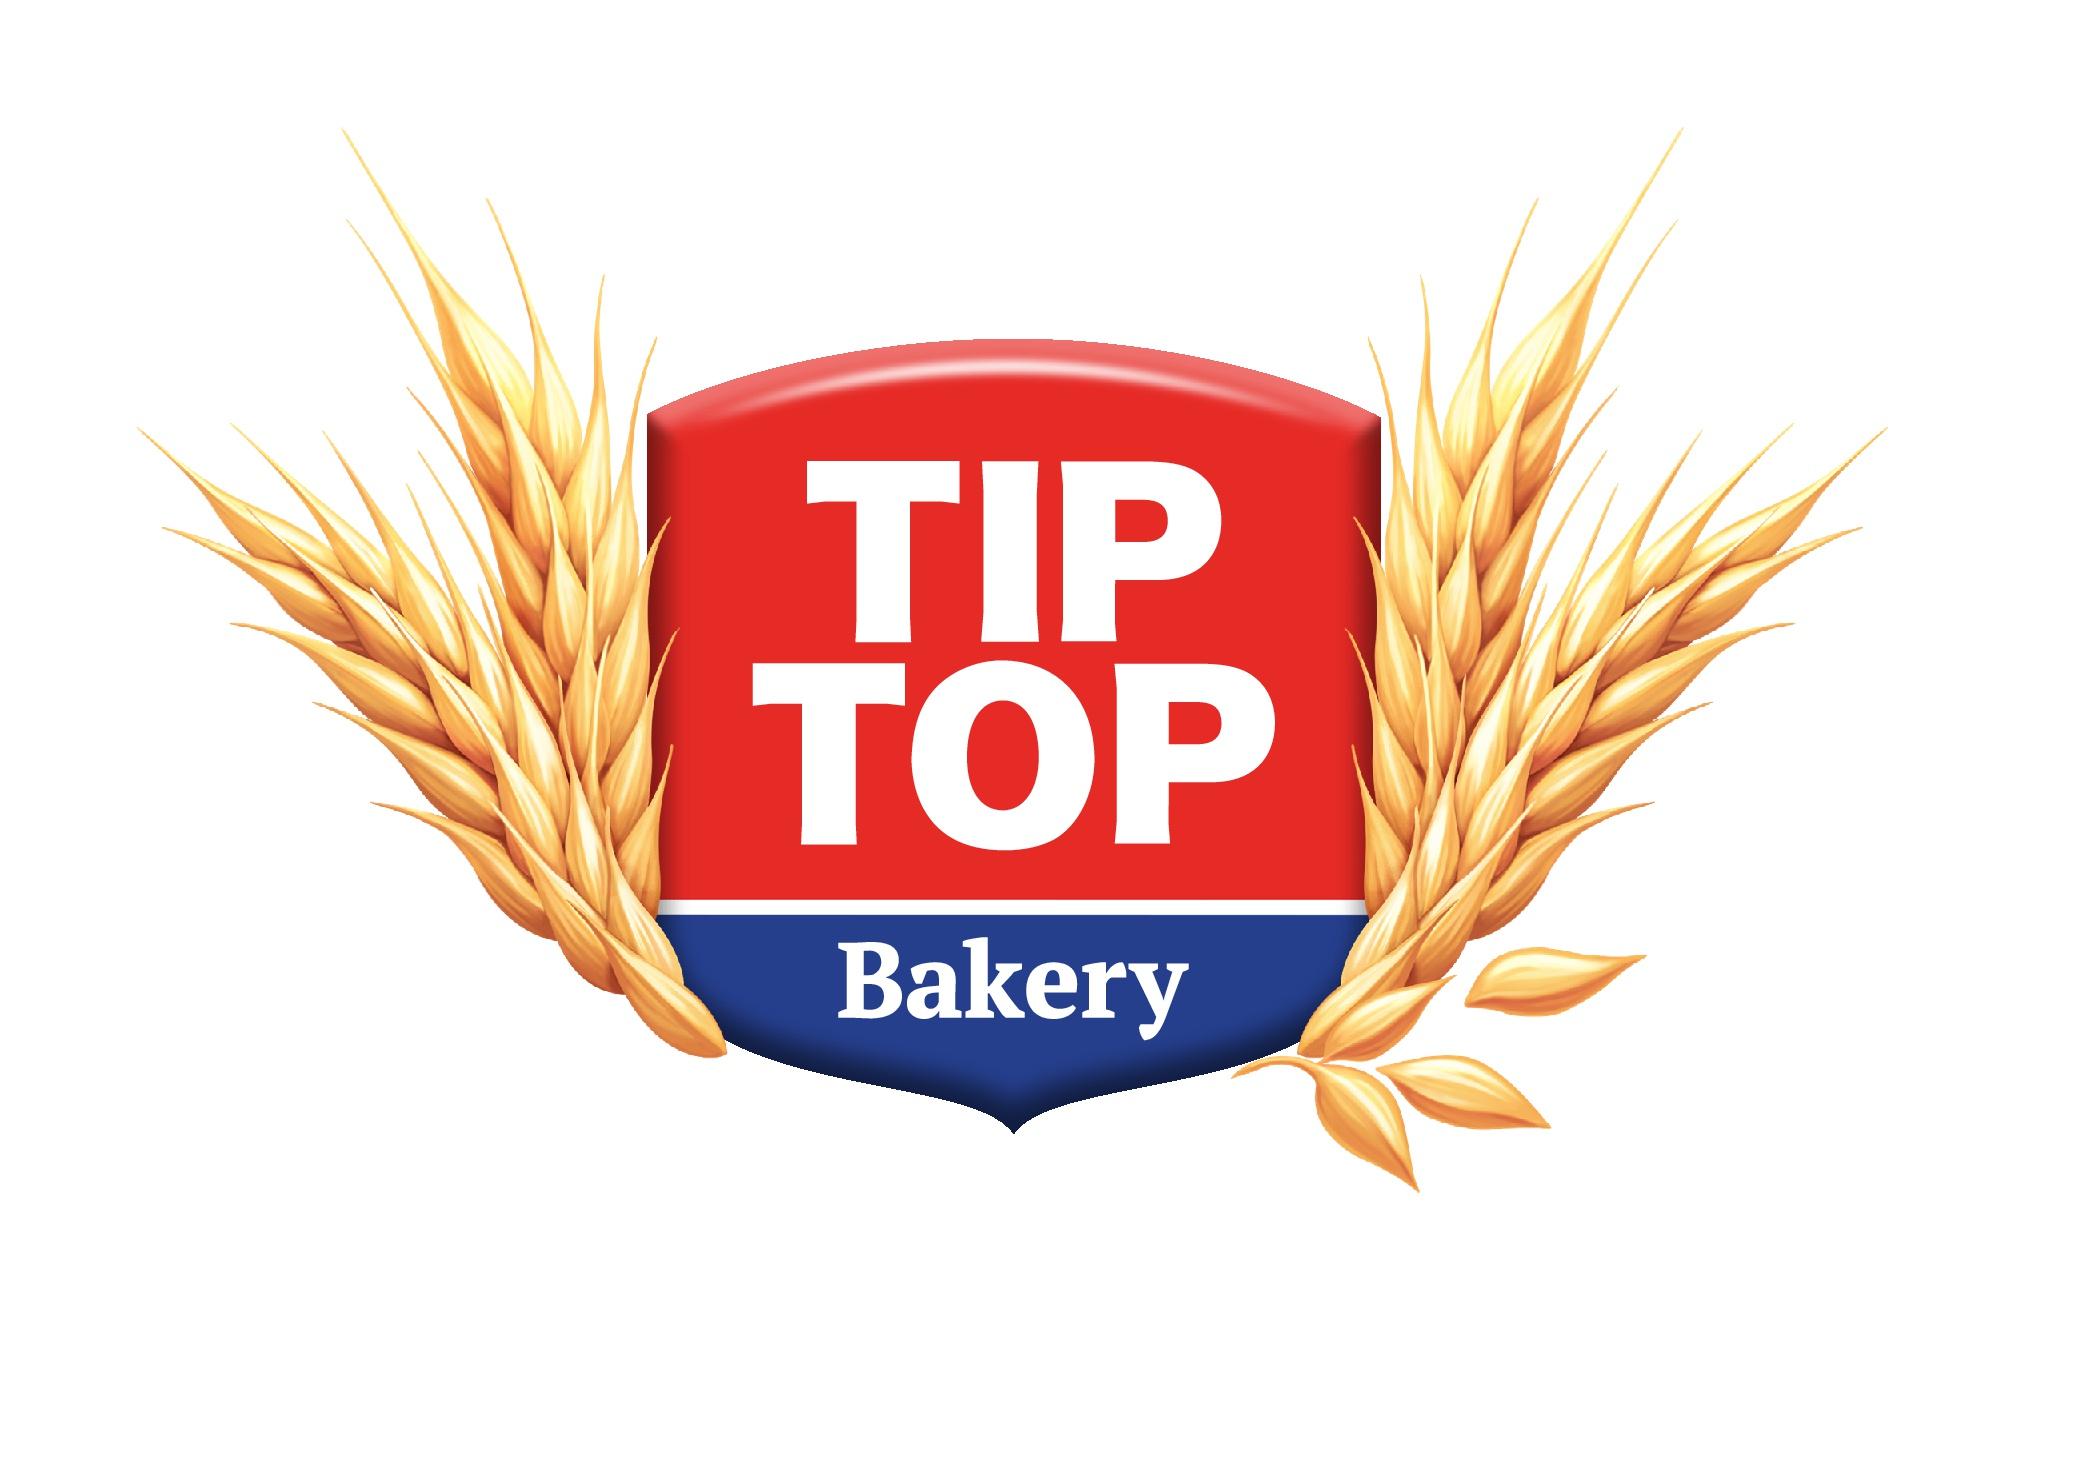 Tip Top Bakery